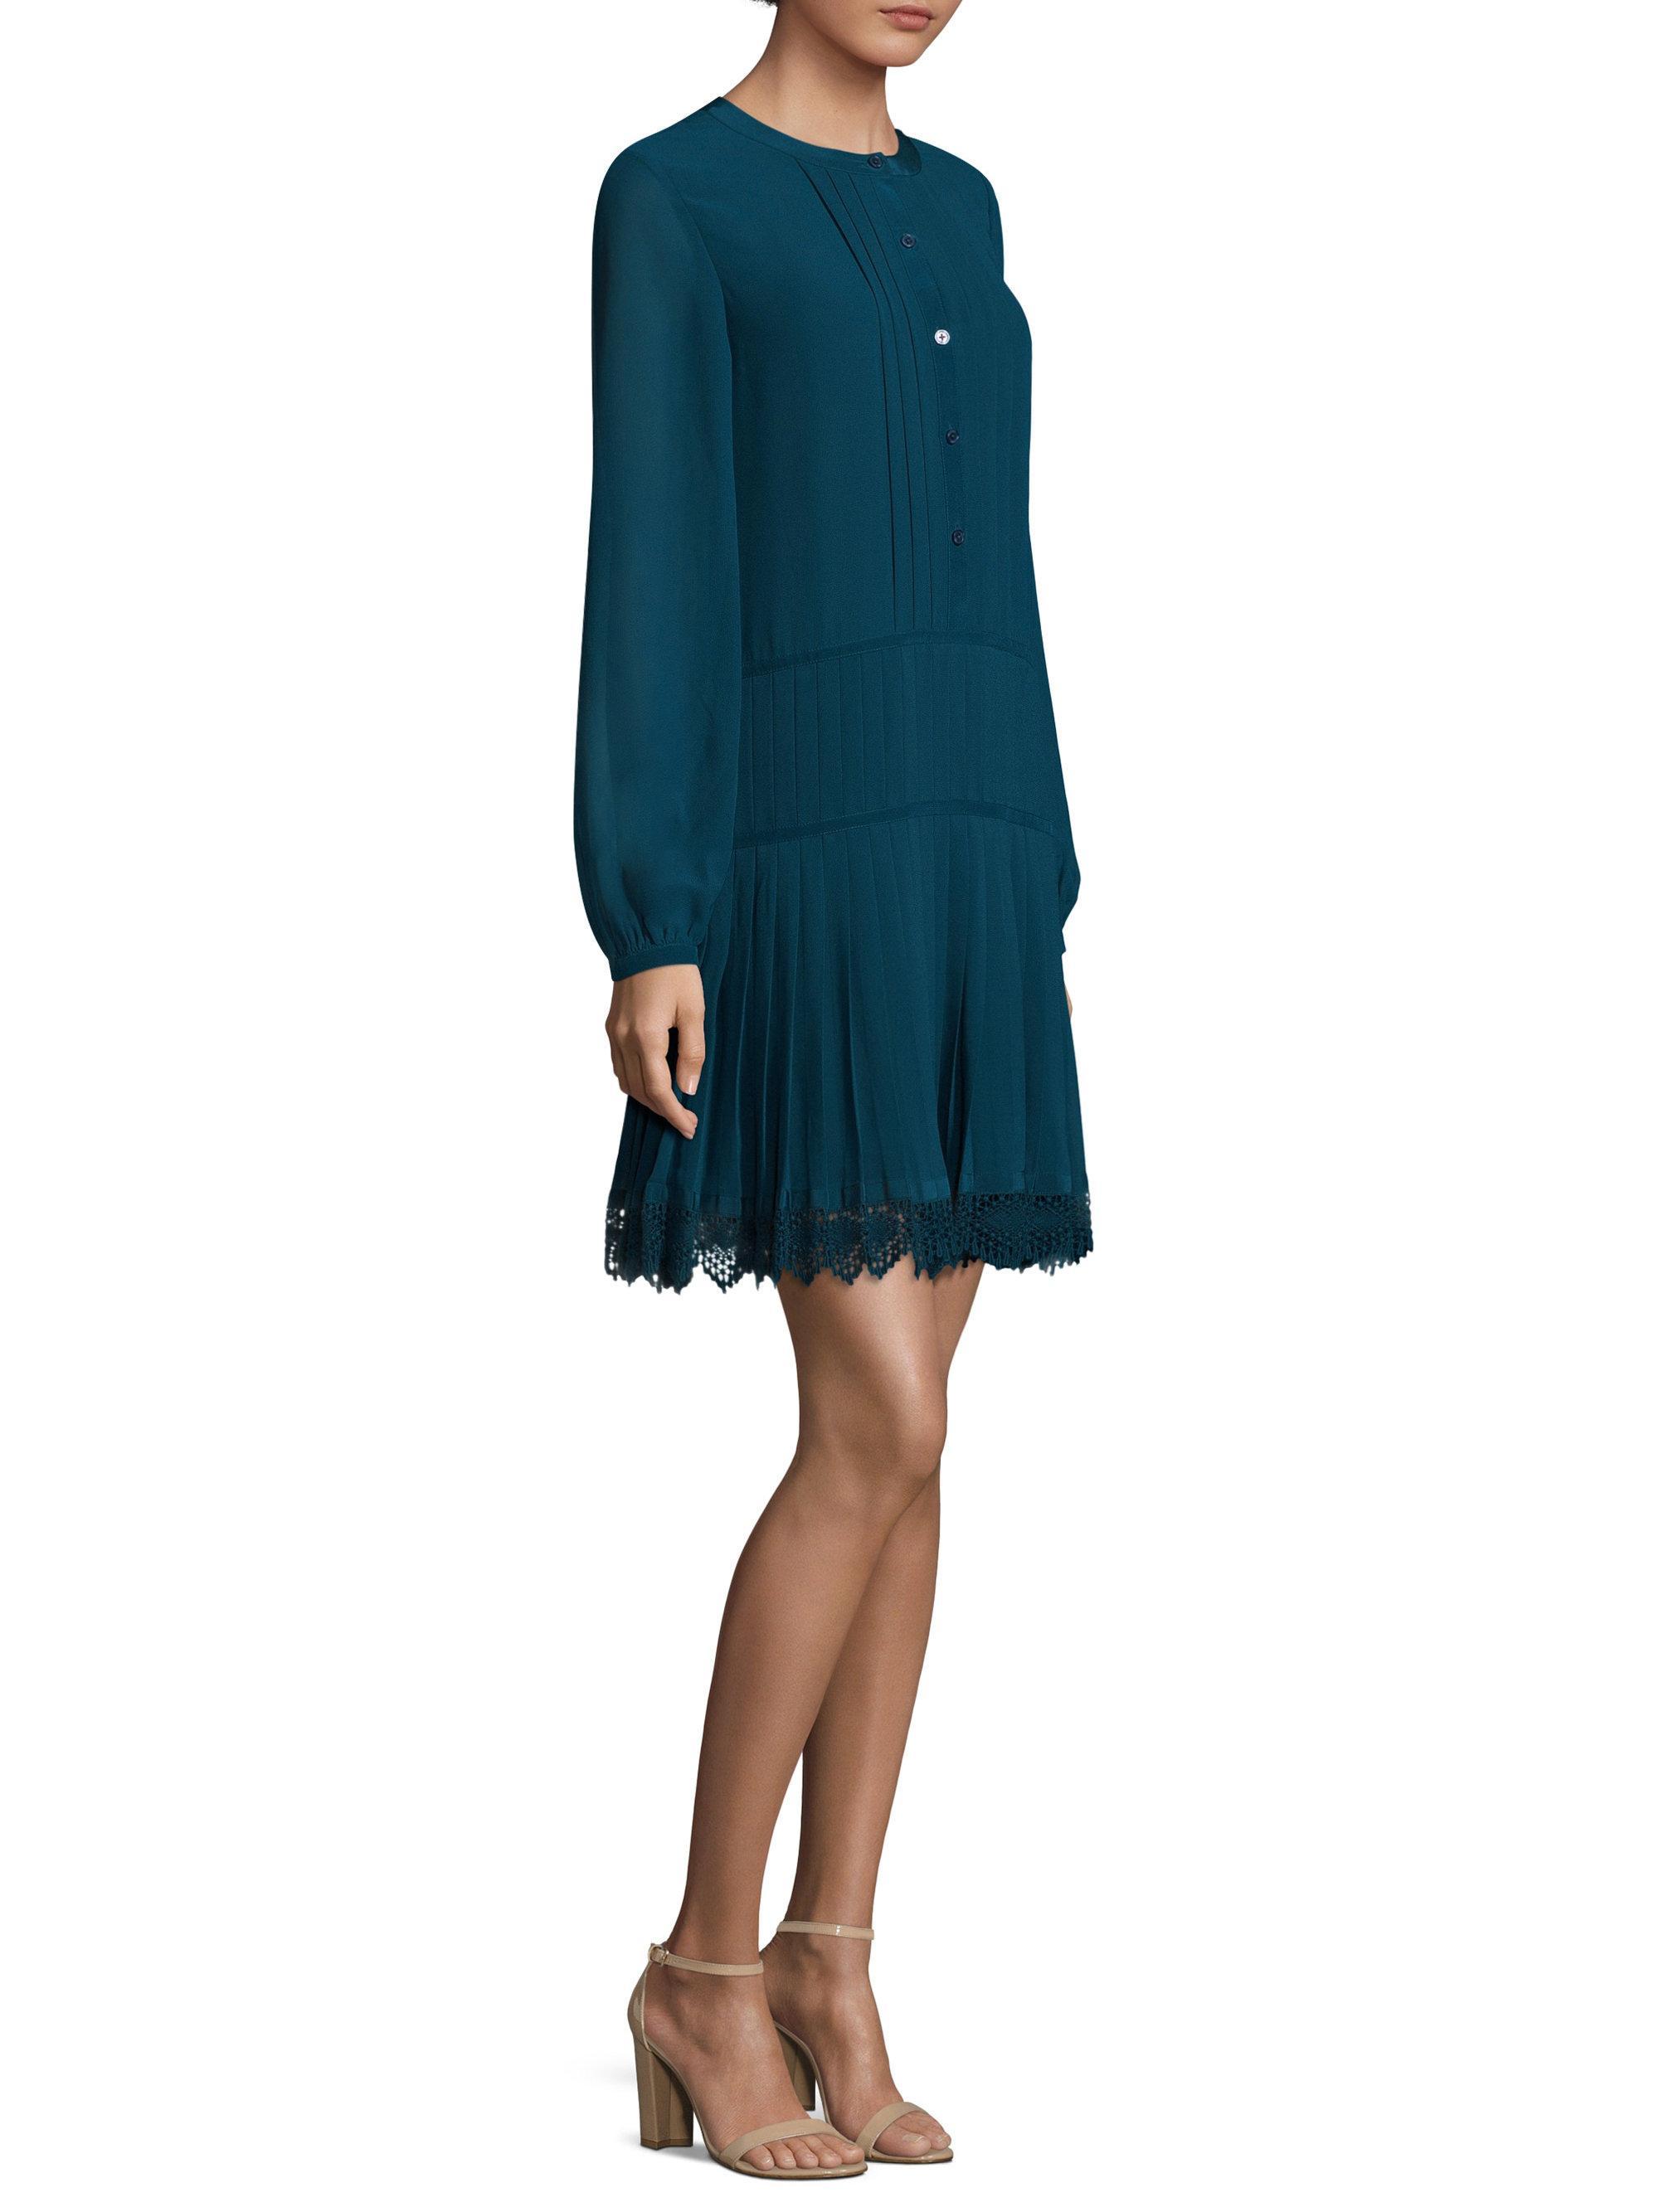 Tory Burch. Women's Blue Sydney Dress